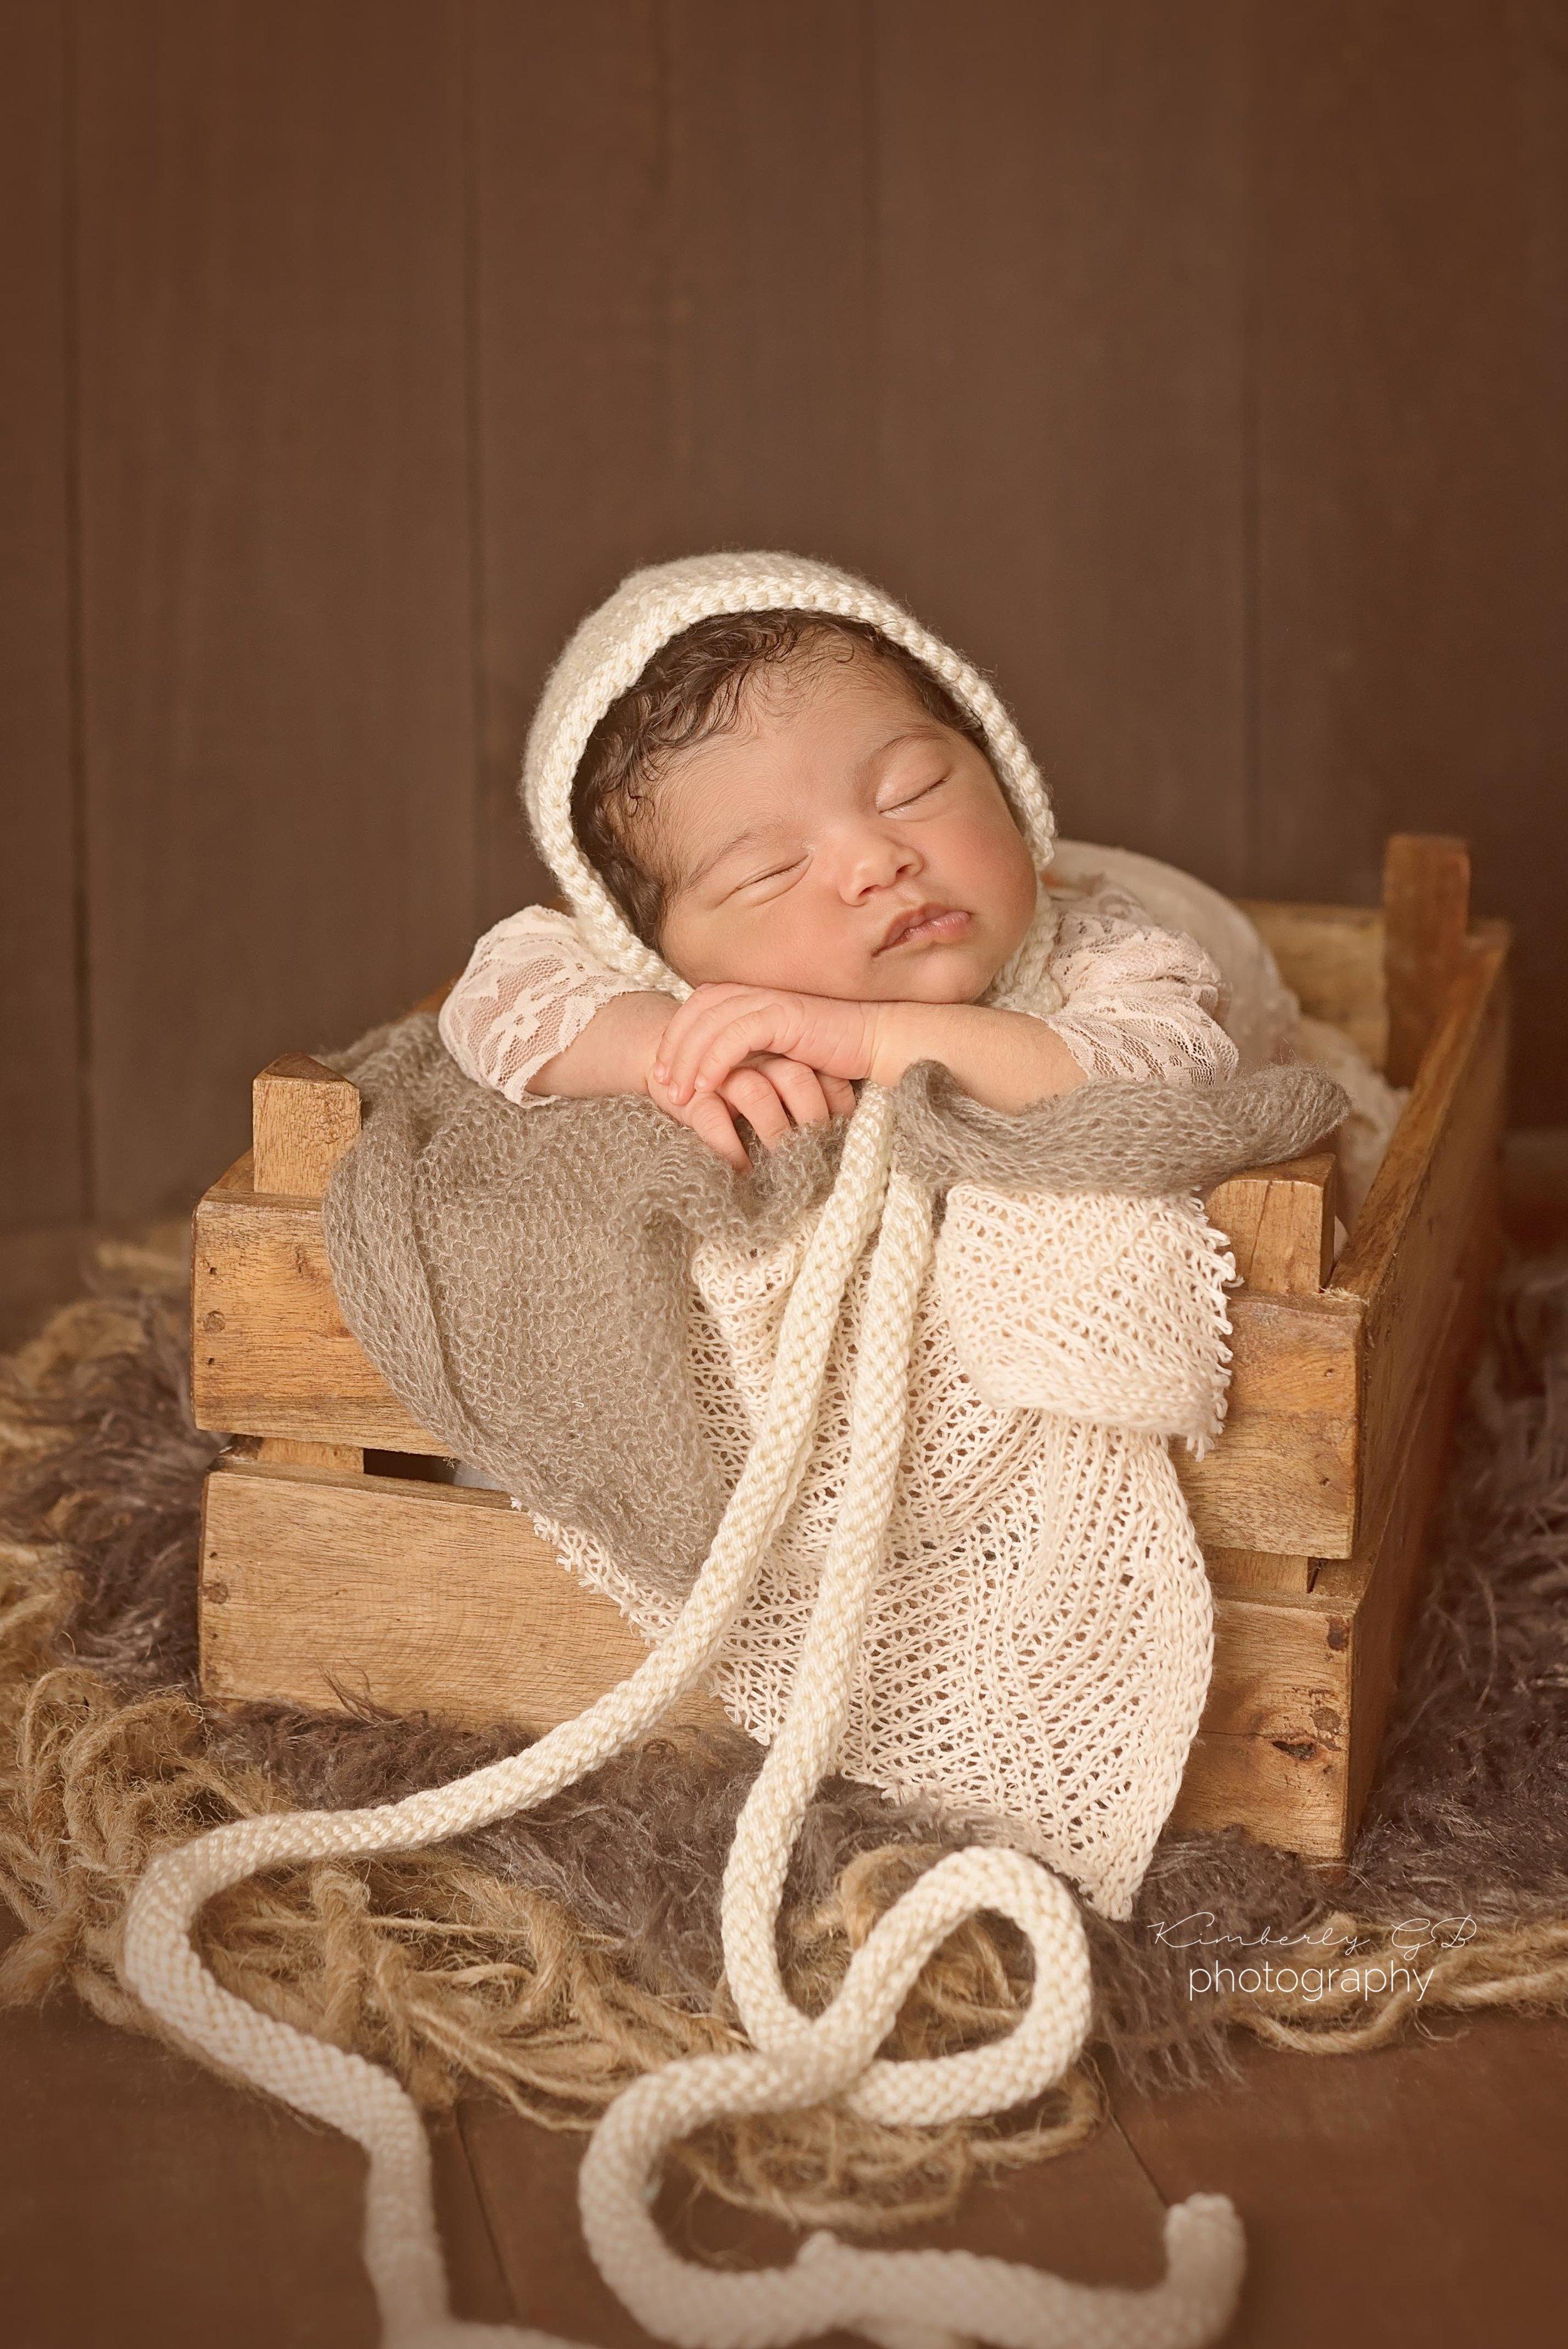 fotografia-de-recien-nacidos-bebes-newborn-en-puerto-rico-kimberly-gb-photography-fotografa-130.jpg